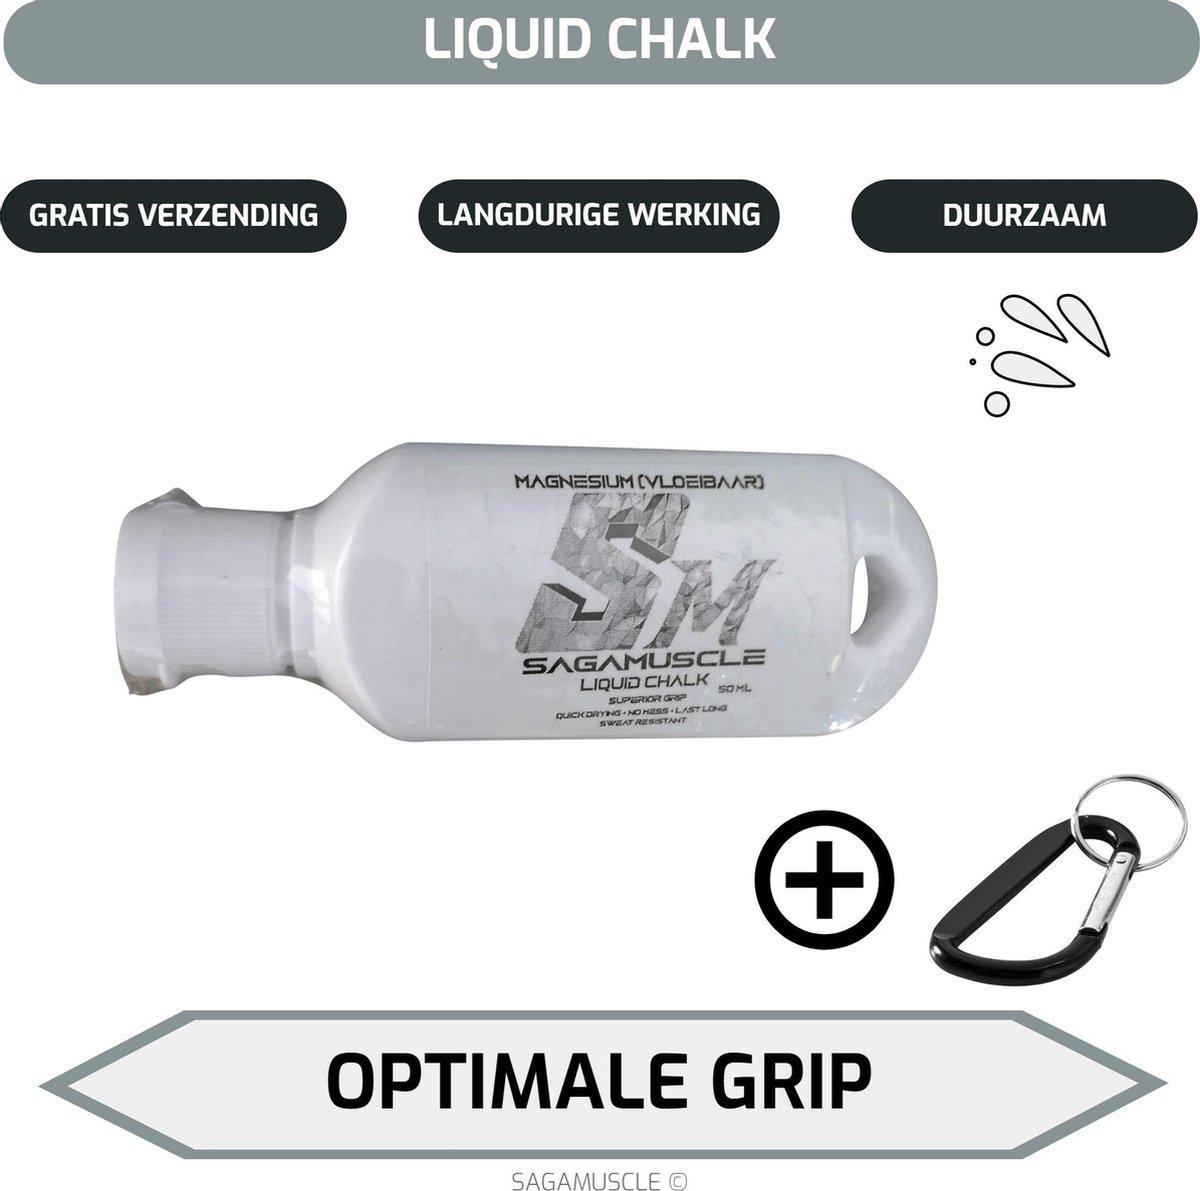 Sagamuscle Vloeibaar Magnesium 50ml - Calisthenics - Klimmen - Paaldansen - Turnen - Crossfit - Gewi